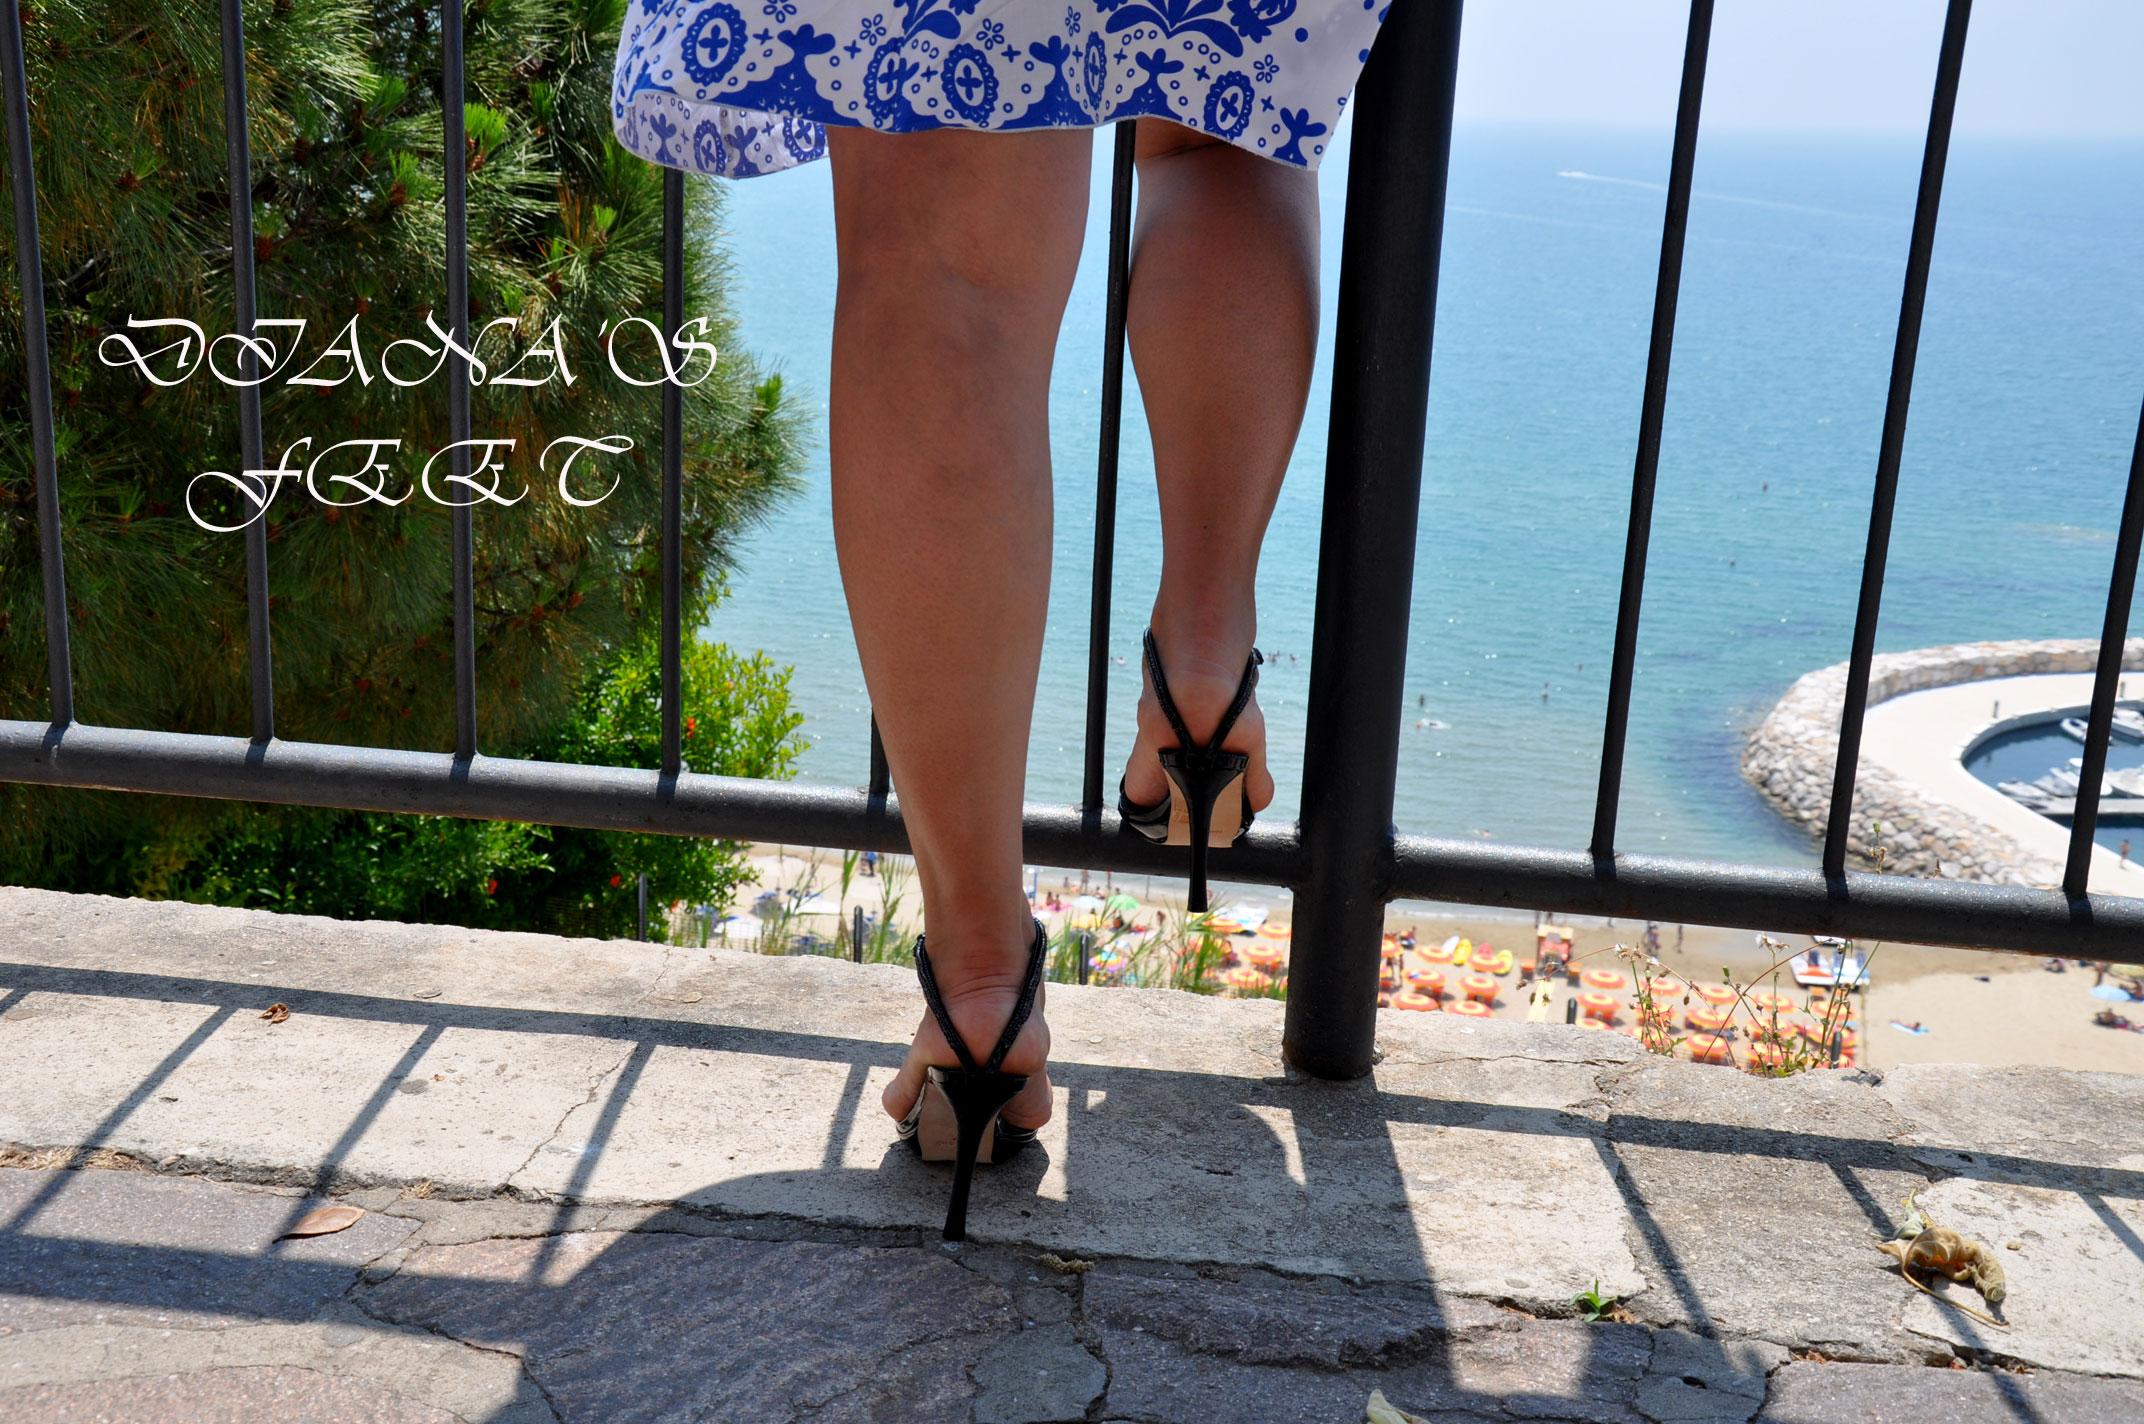 Diana 's feet 02d42310